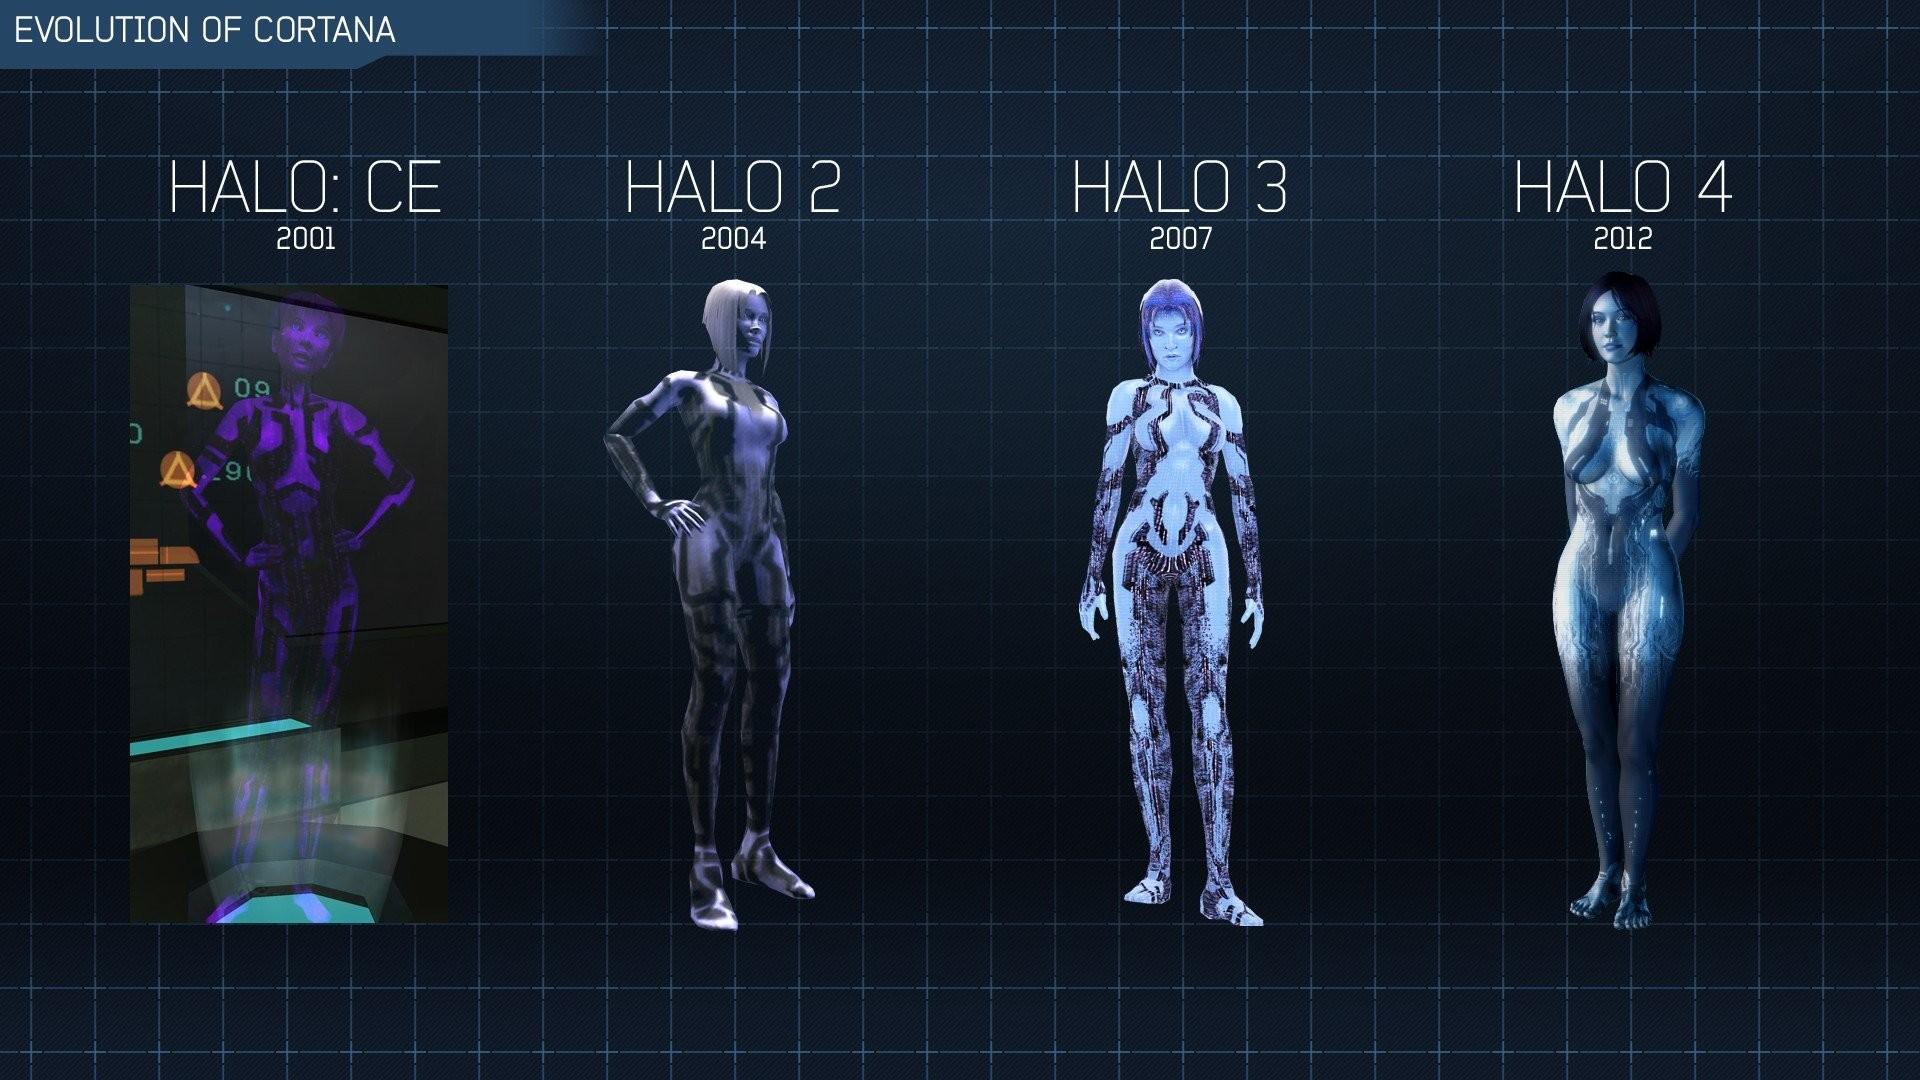 Video games Cortana Halo evolution Halo 4 Halo 2 wallpaper   .